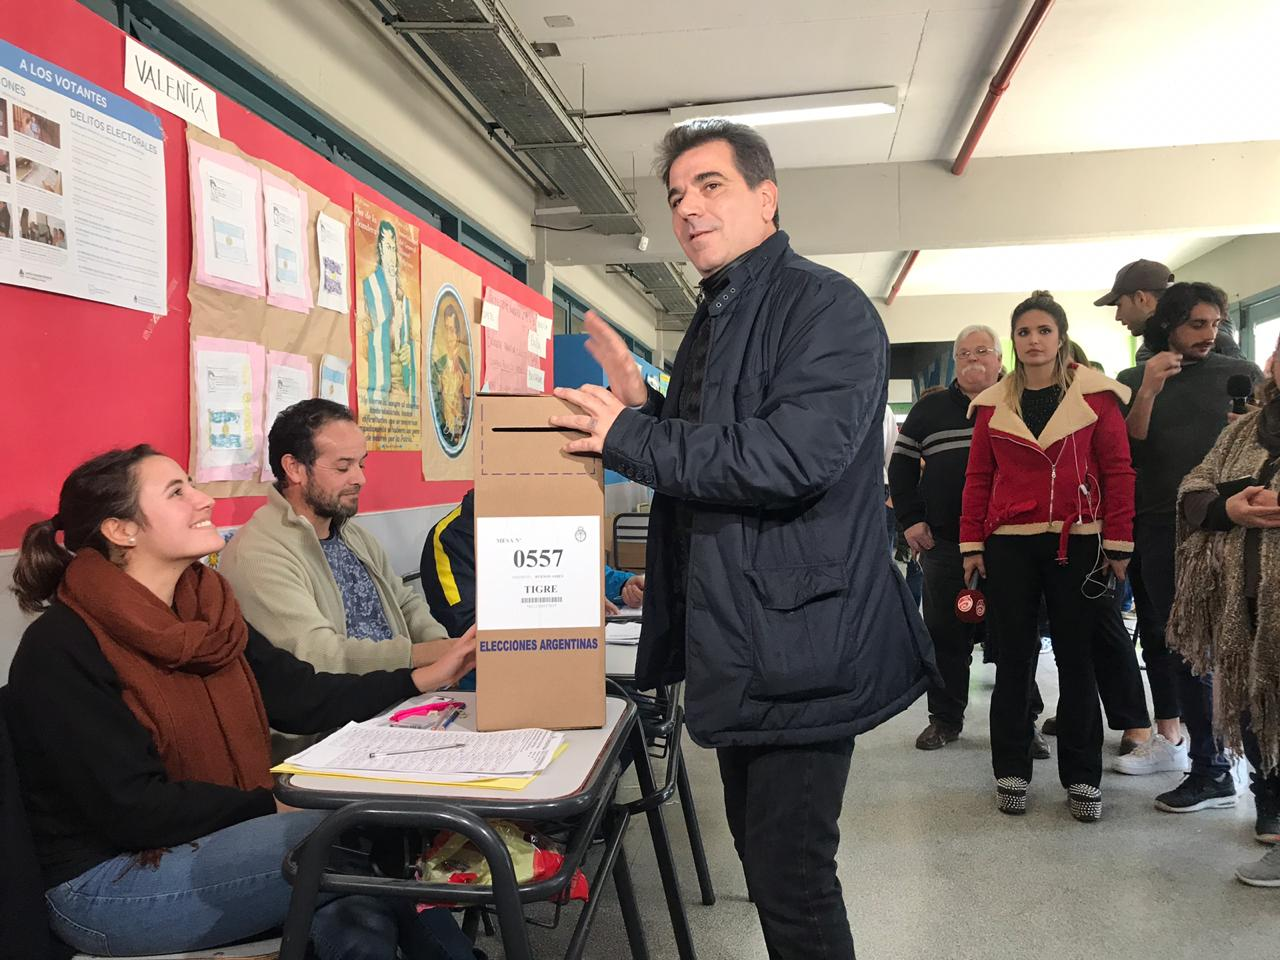 Cristian Ritondo, ministro de seguridad bonaerense y candidato a diputado nacional